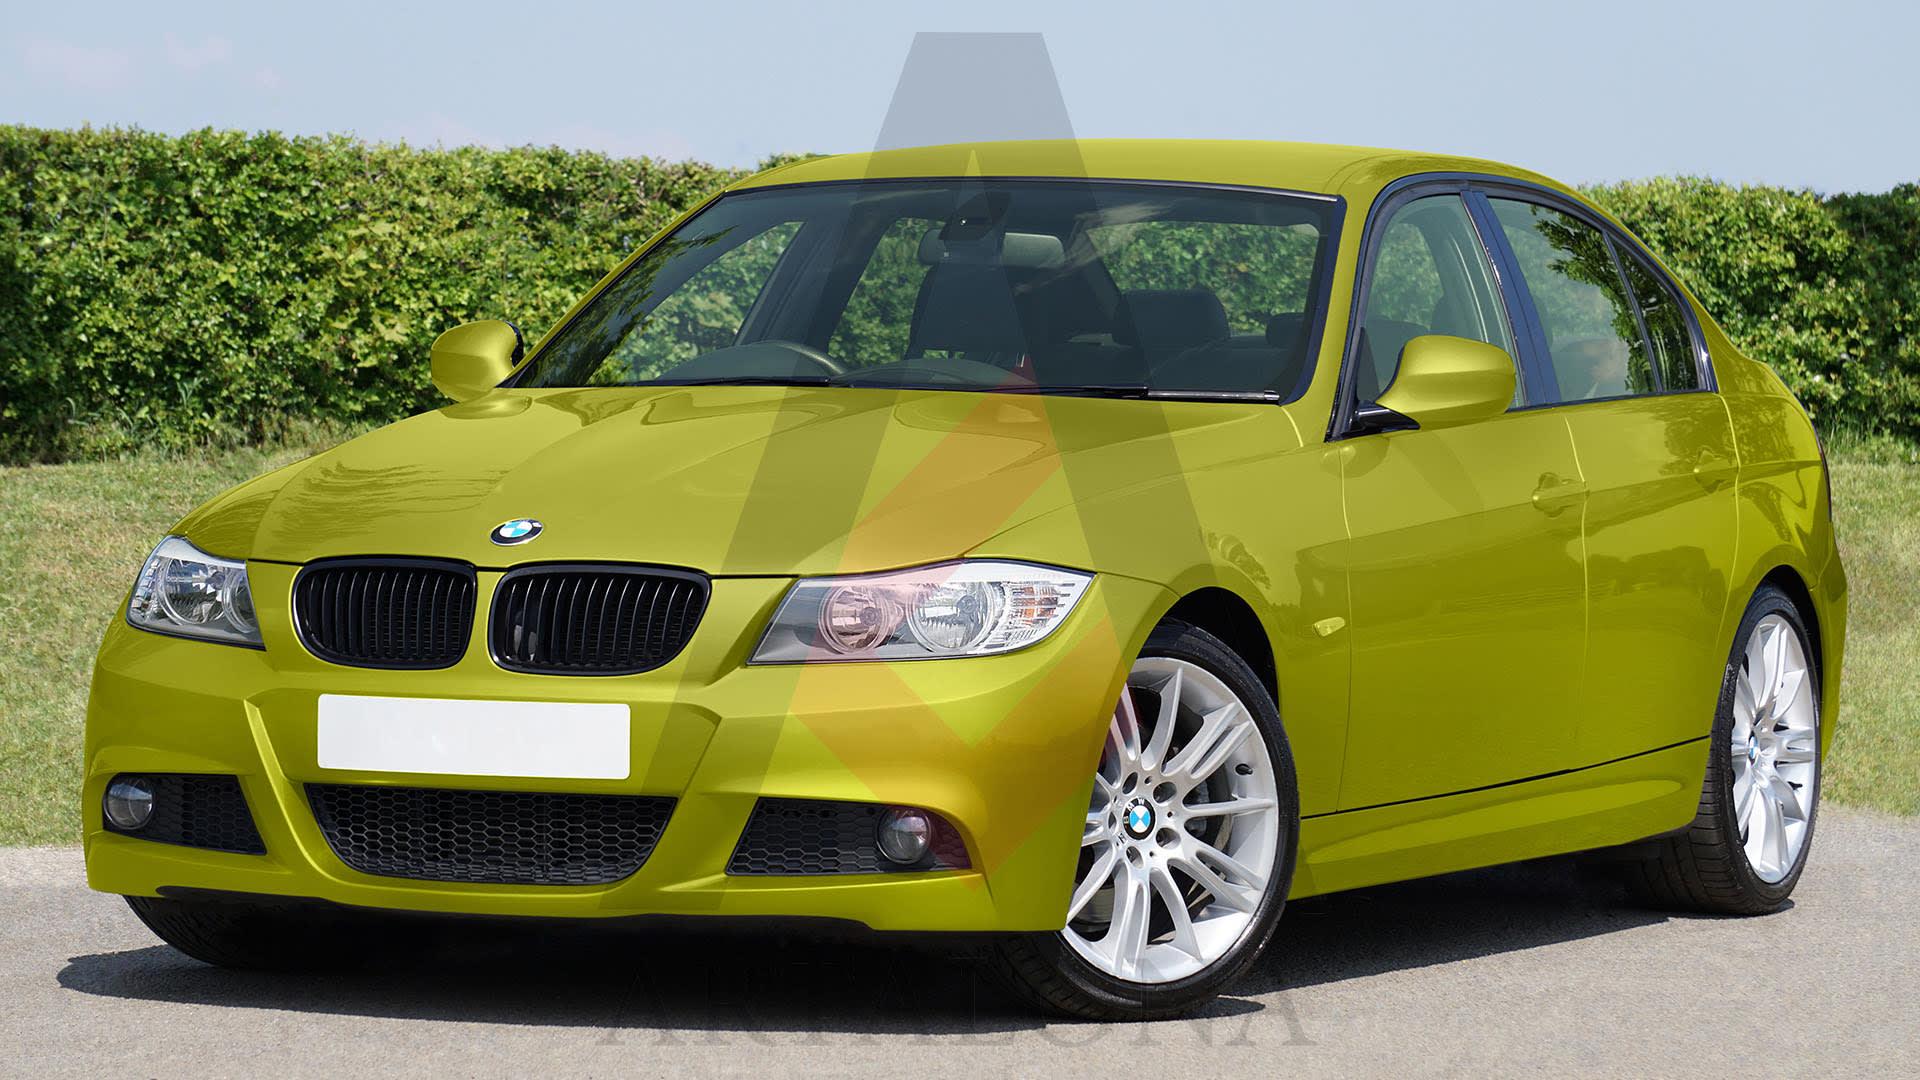 After-Automotive Color Changing